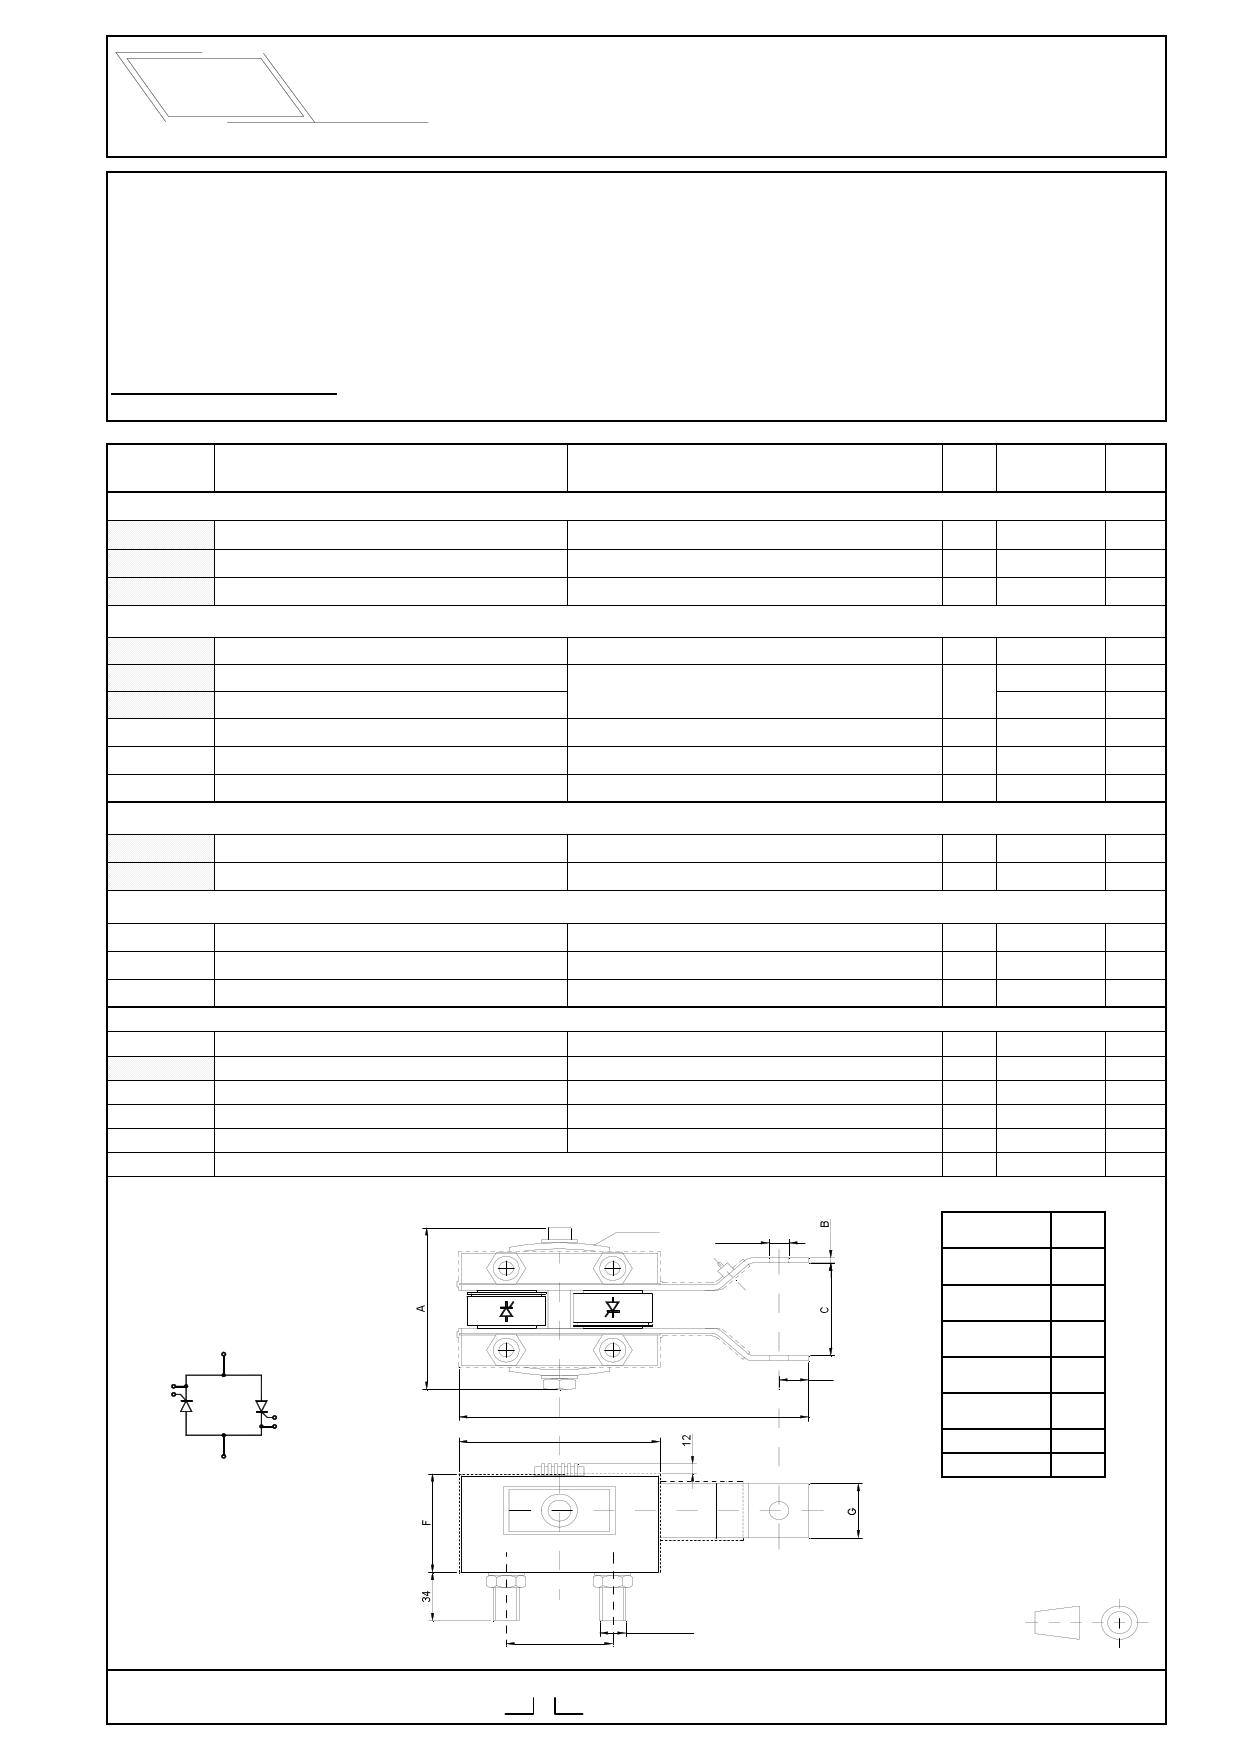 2-2W5I-AT603S16 datasheet